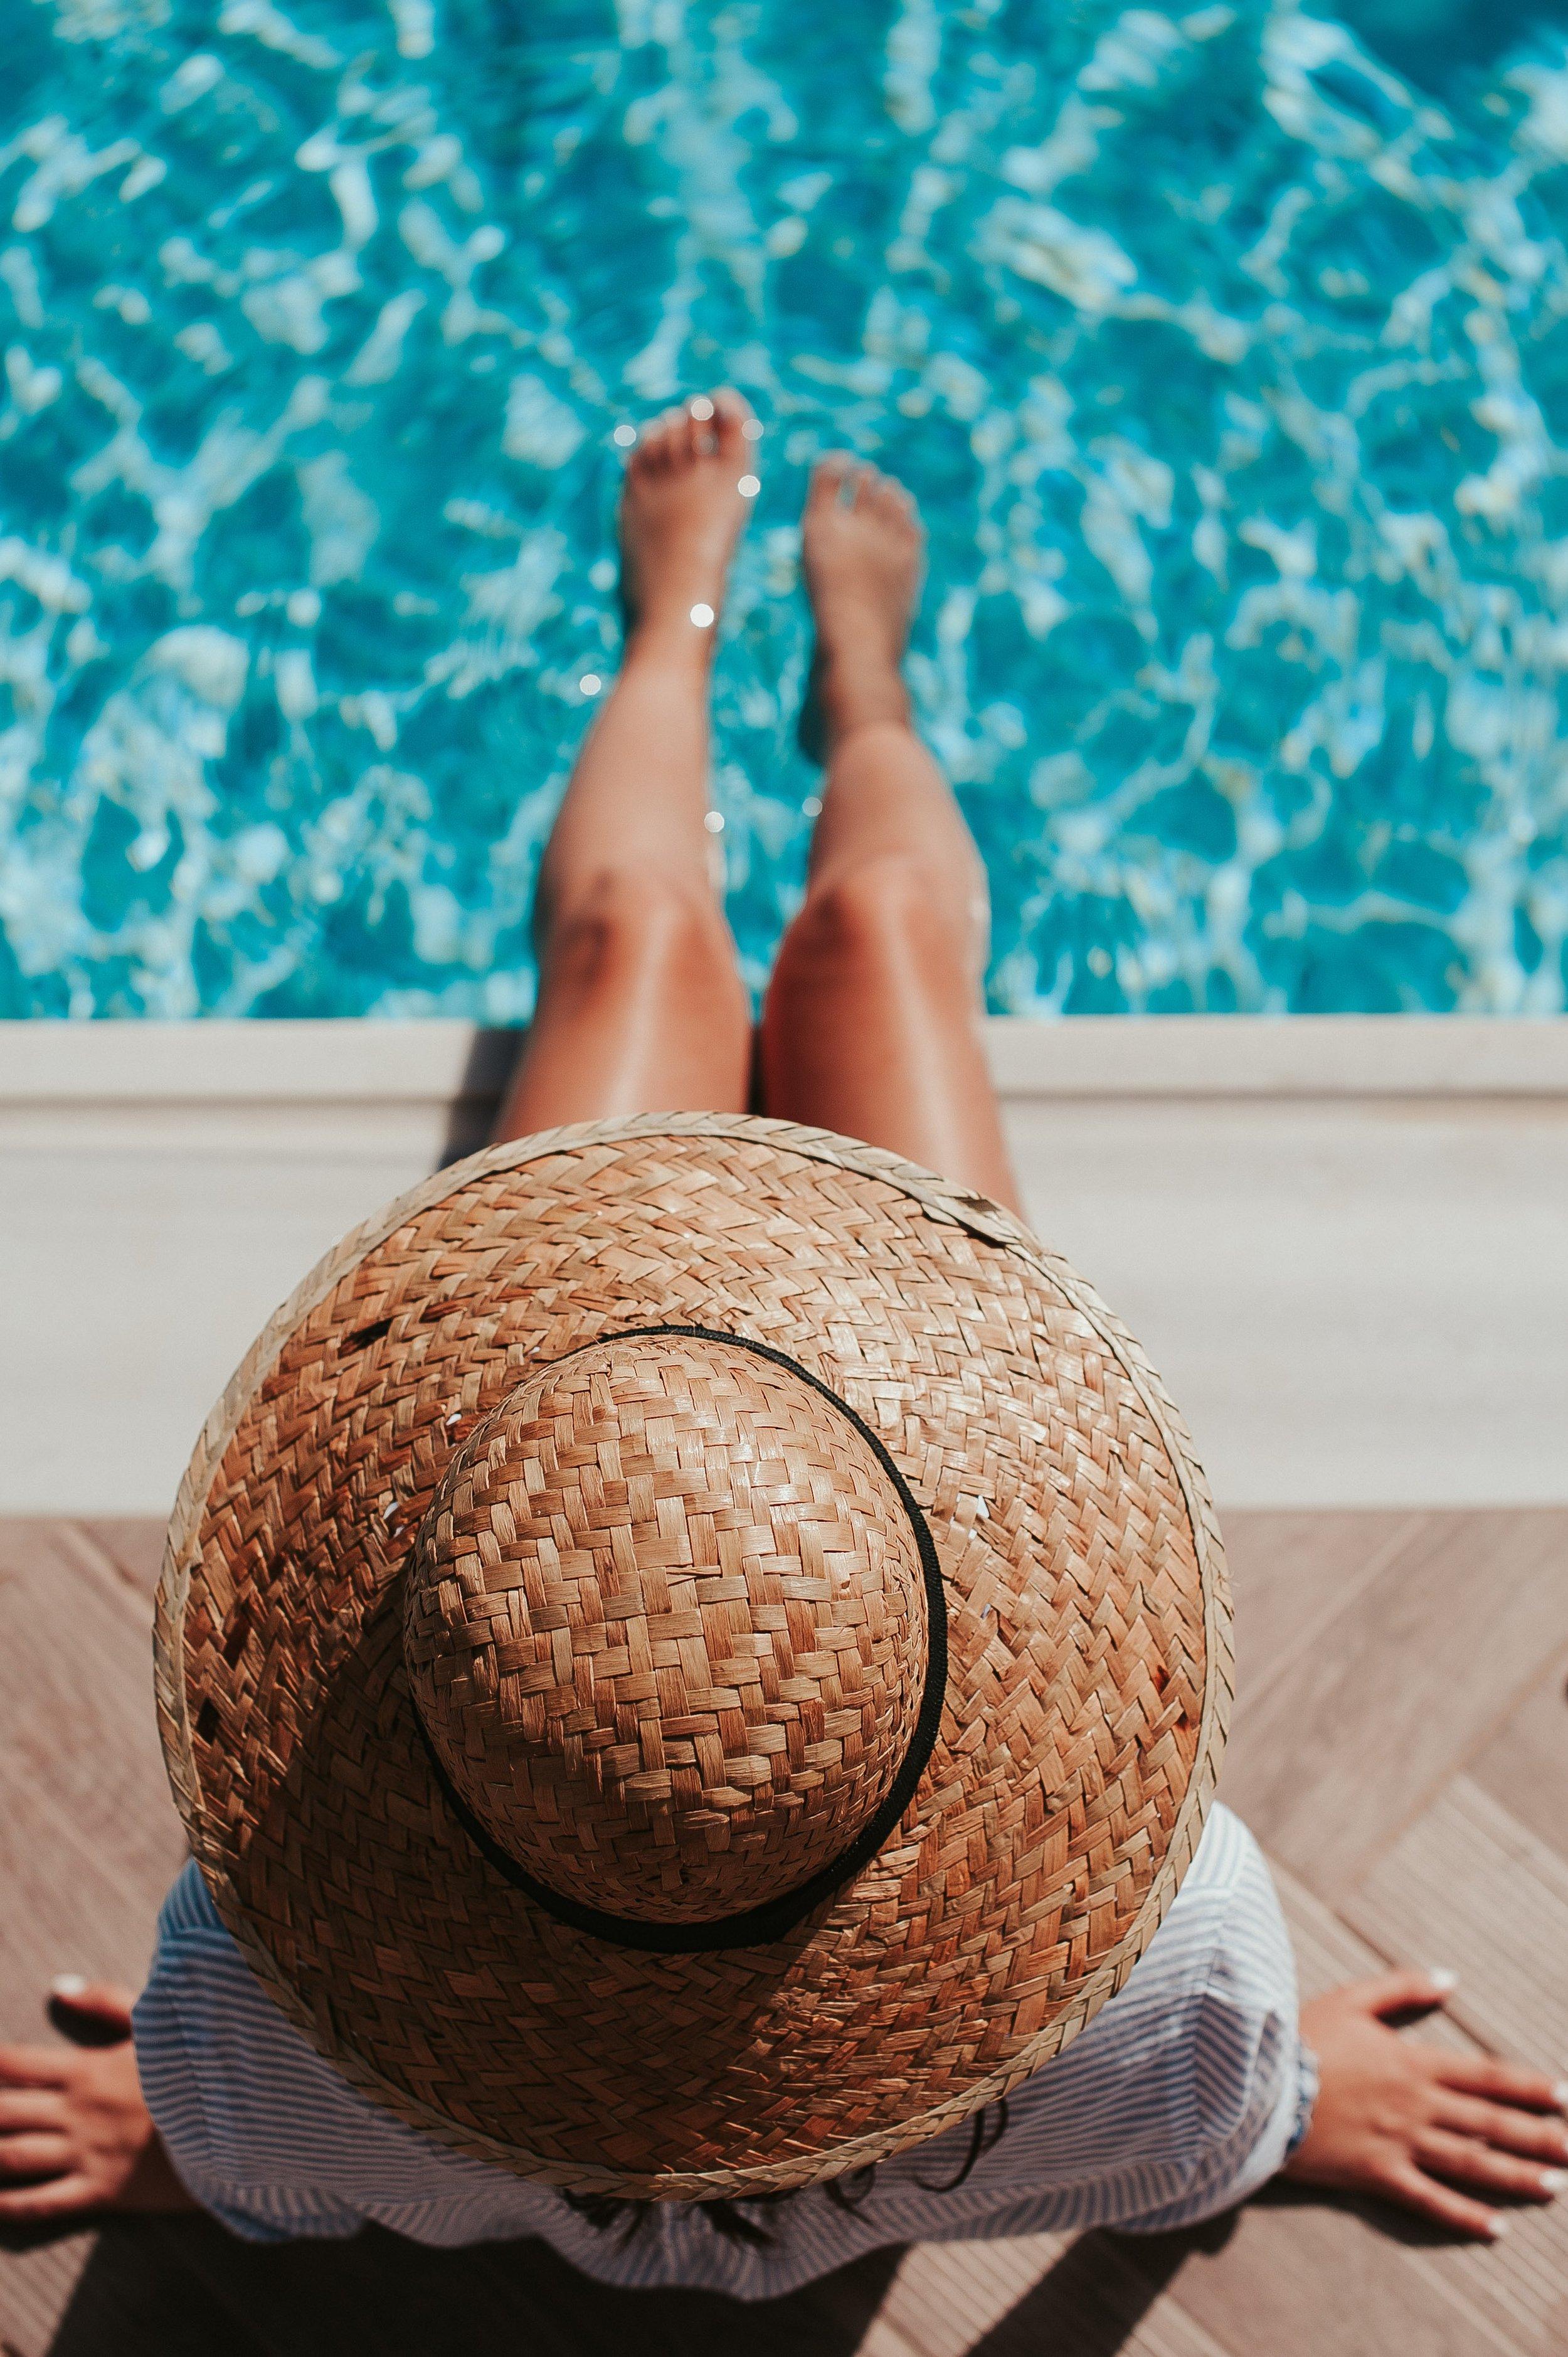 5 Summer Skin Care Sins to Avoid